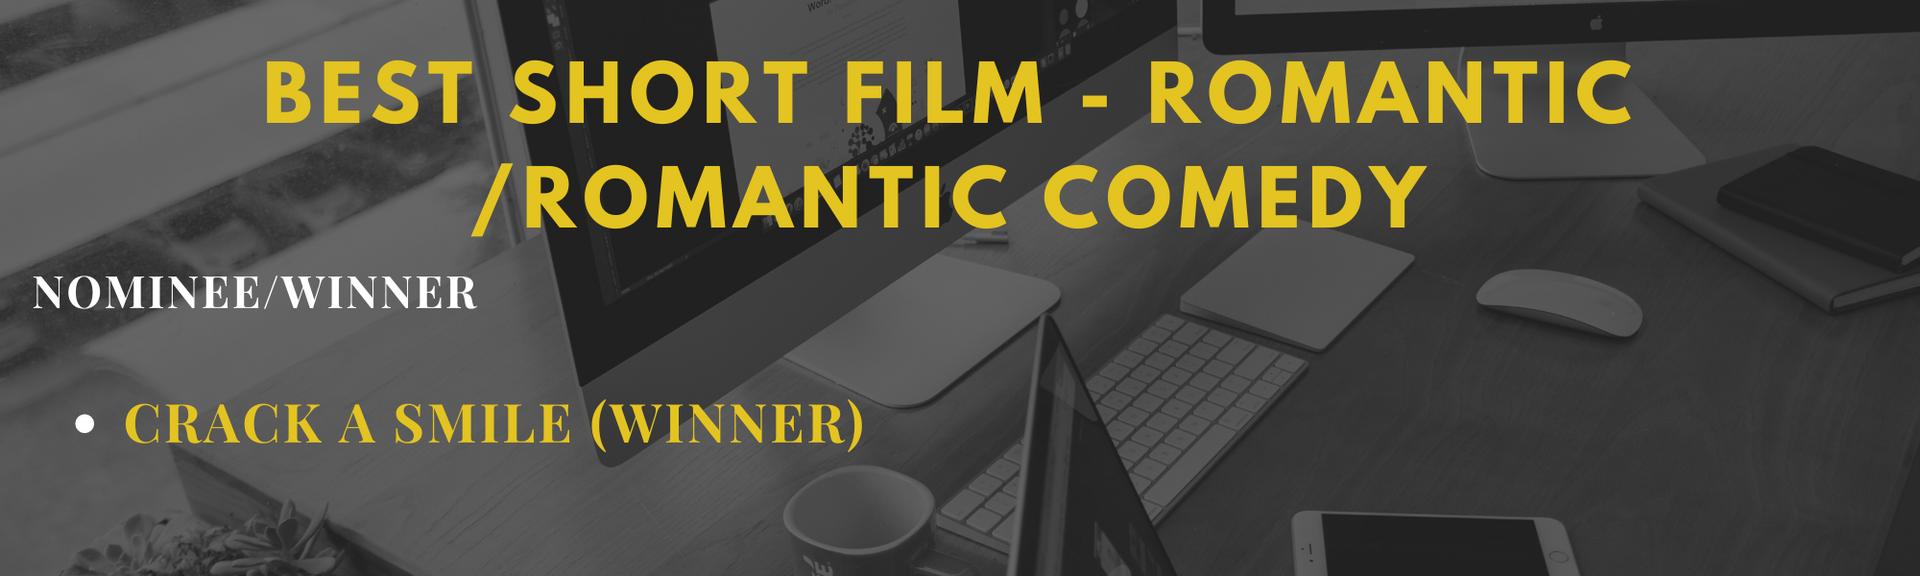 Best Short Film - Romantic/Romantic Comed